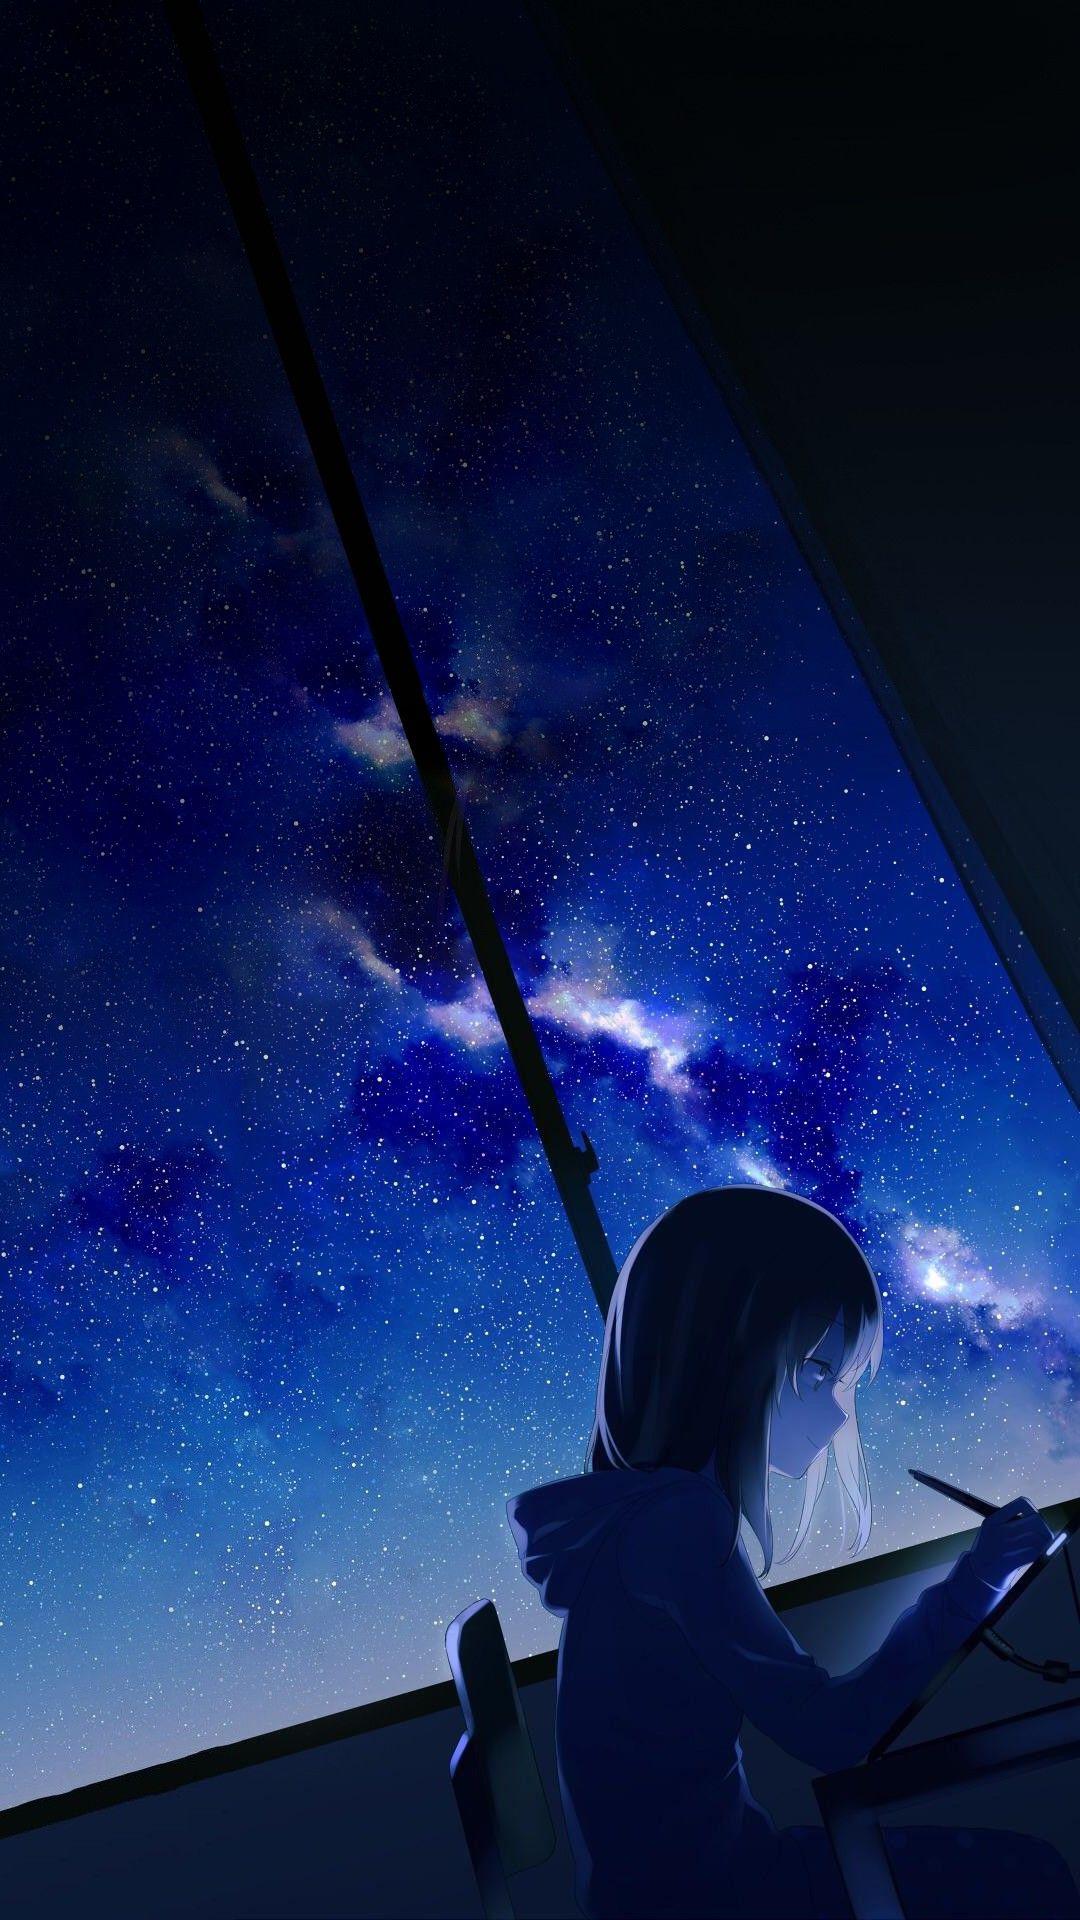 Wallpaper Anime Qui Bouge - Animeindo